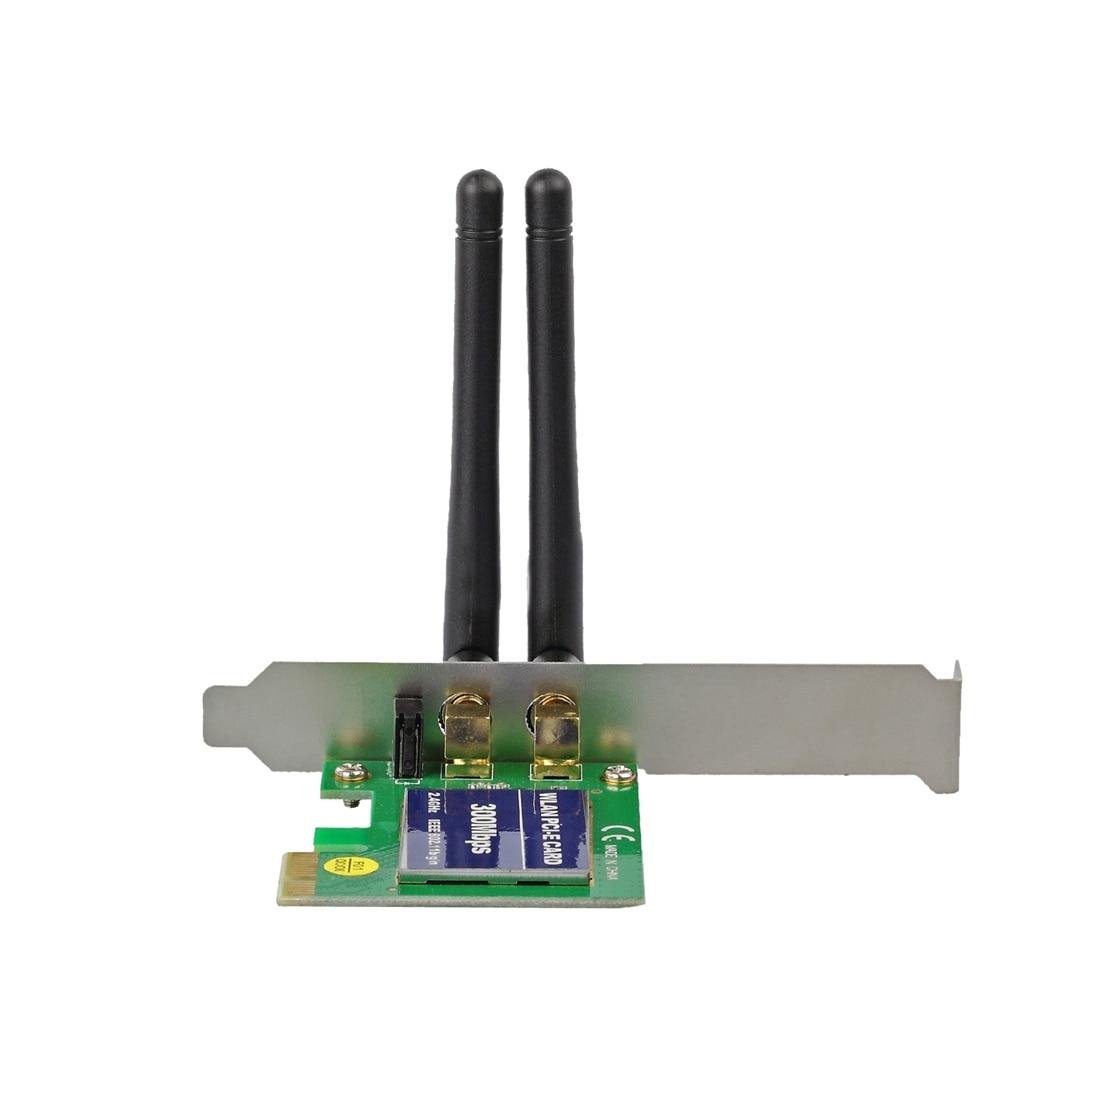 300Mbps Wireless N WIFI PCI Network Adapter Card Lan Dongle + Antenna Desktop PC